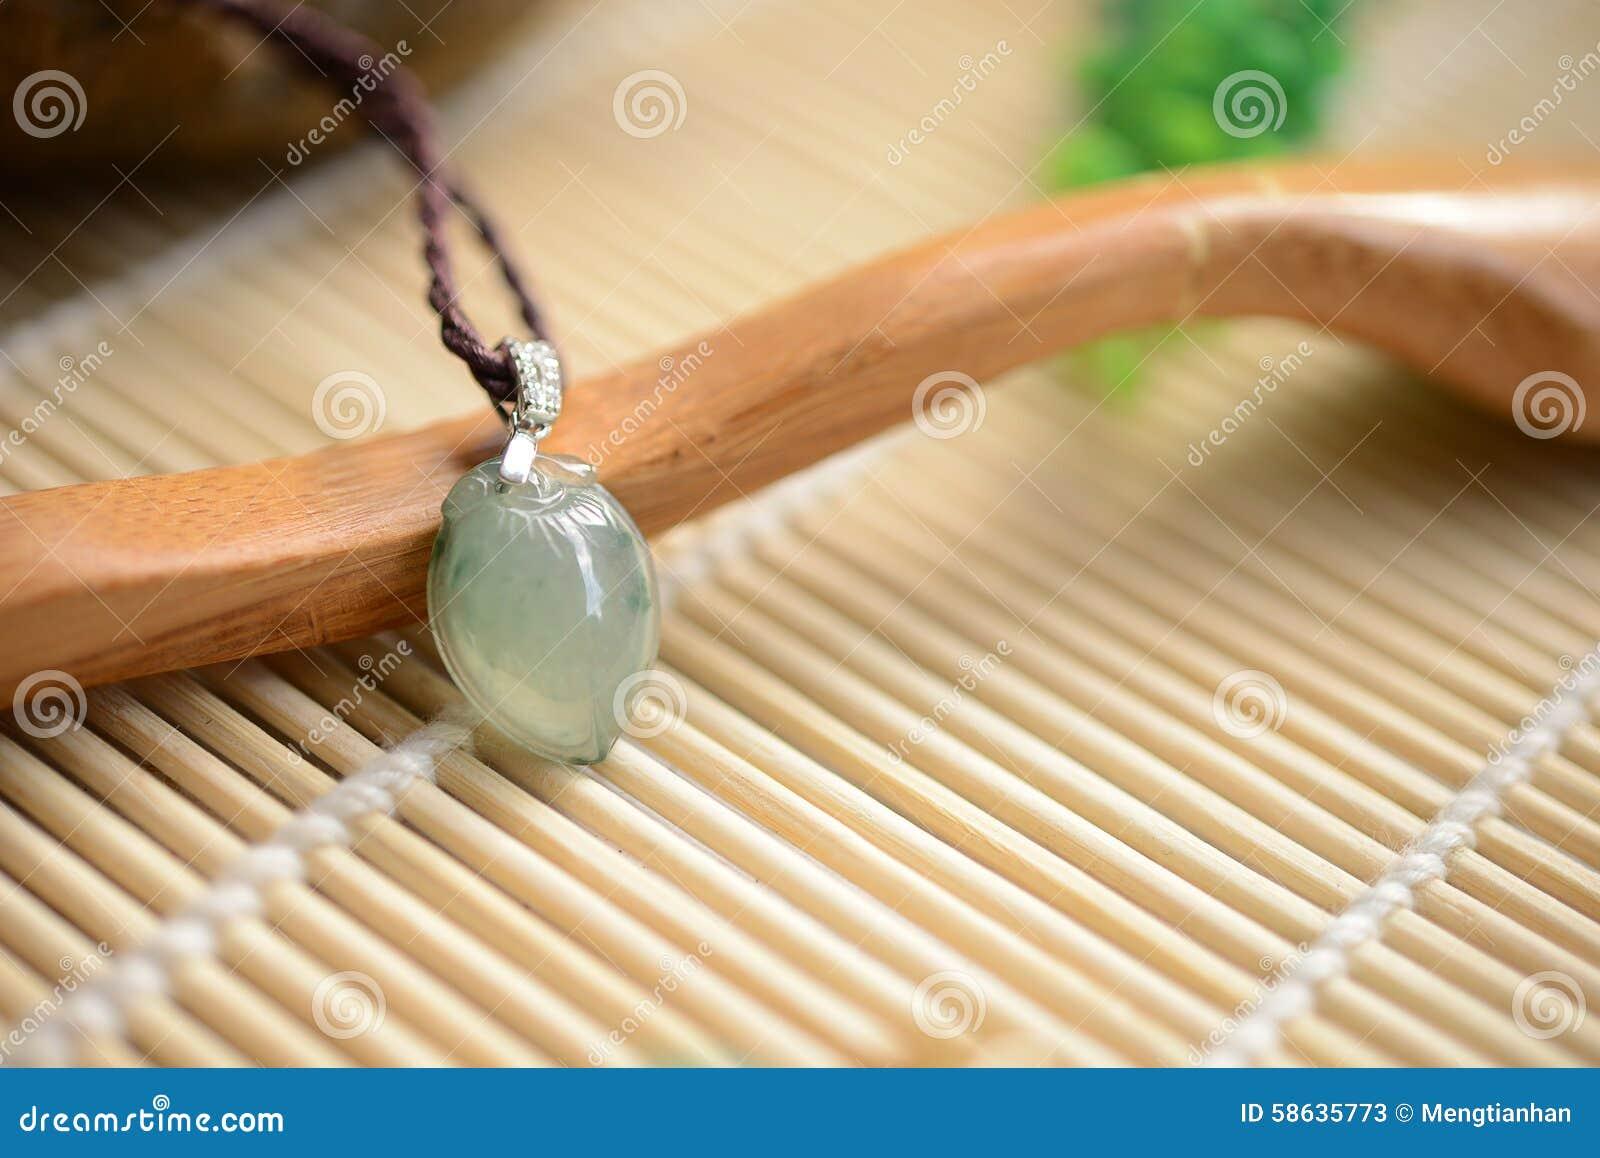 Jade Pendant Of Water Drop Style Stock Image Image Of Bead Beauty